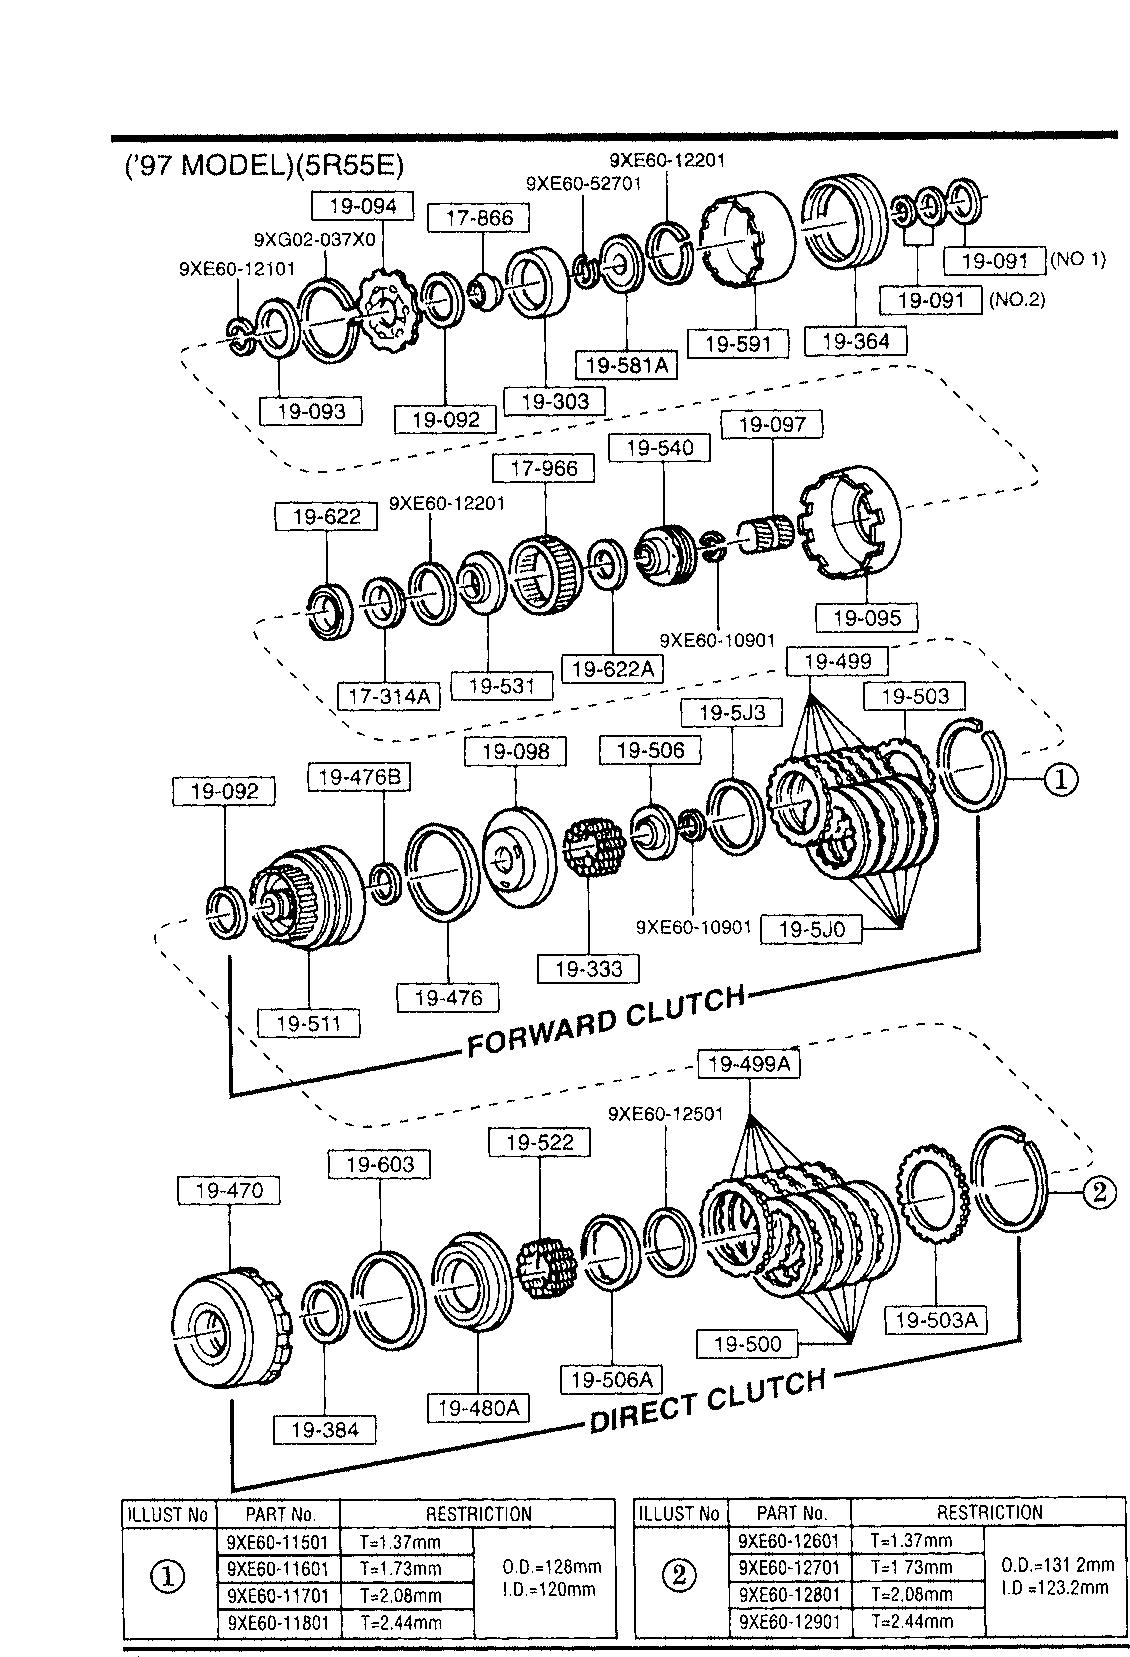 USA, 1994 B4000, GASOLINE-ENGINE 4-CYLINDER TRANSMISSION, 1930A